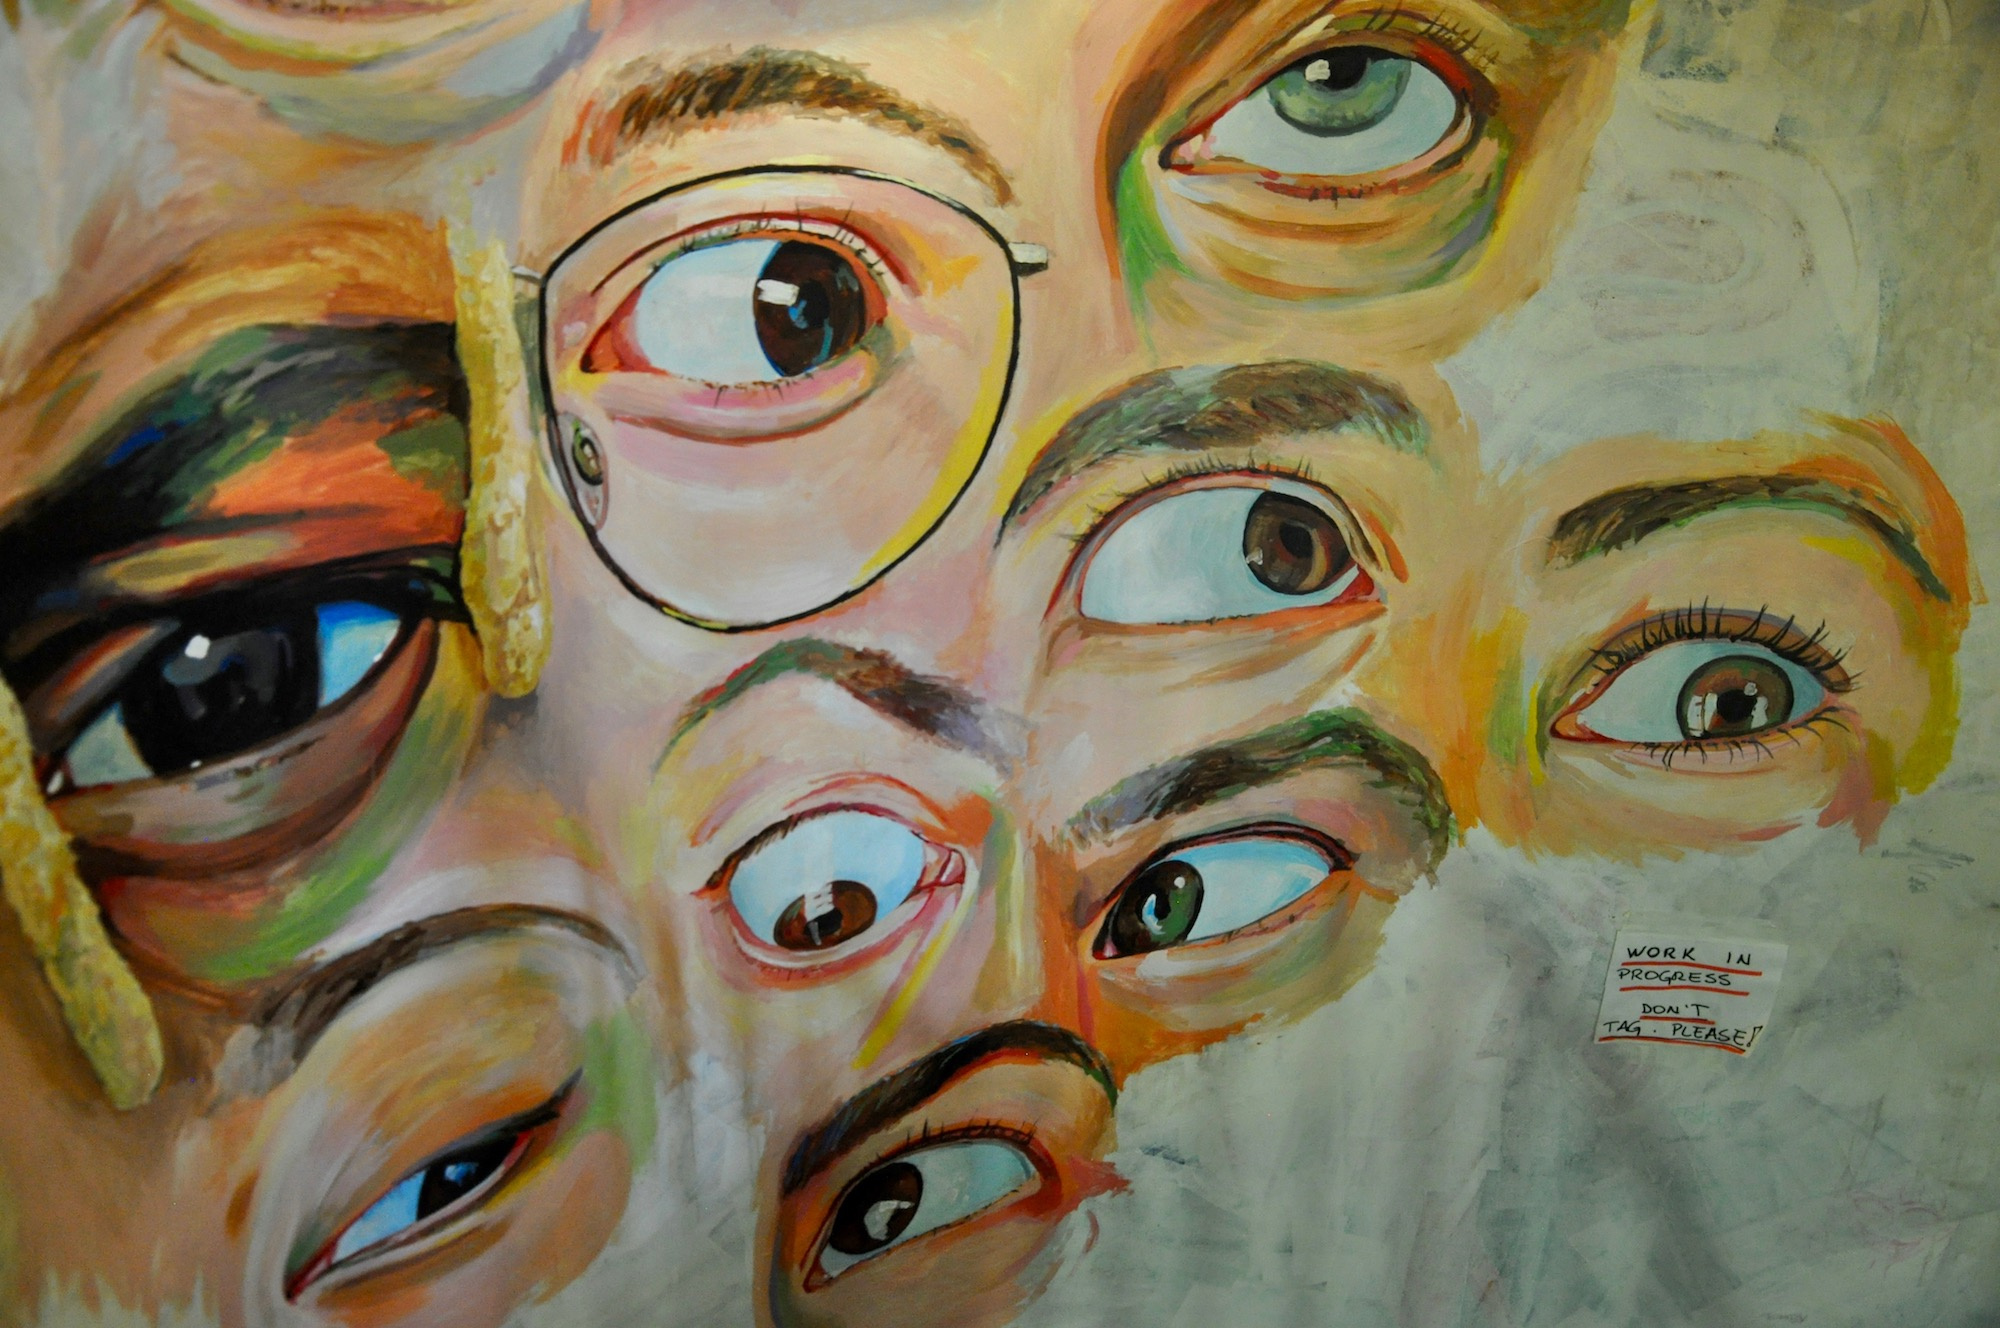 A painted mural of eyes at the Paris artist squat 59 Rivoli.